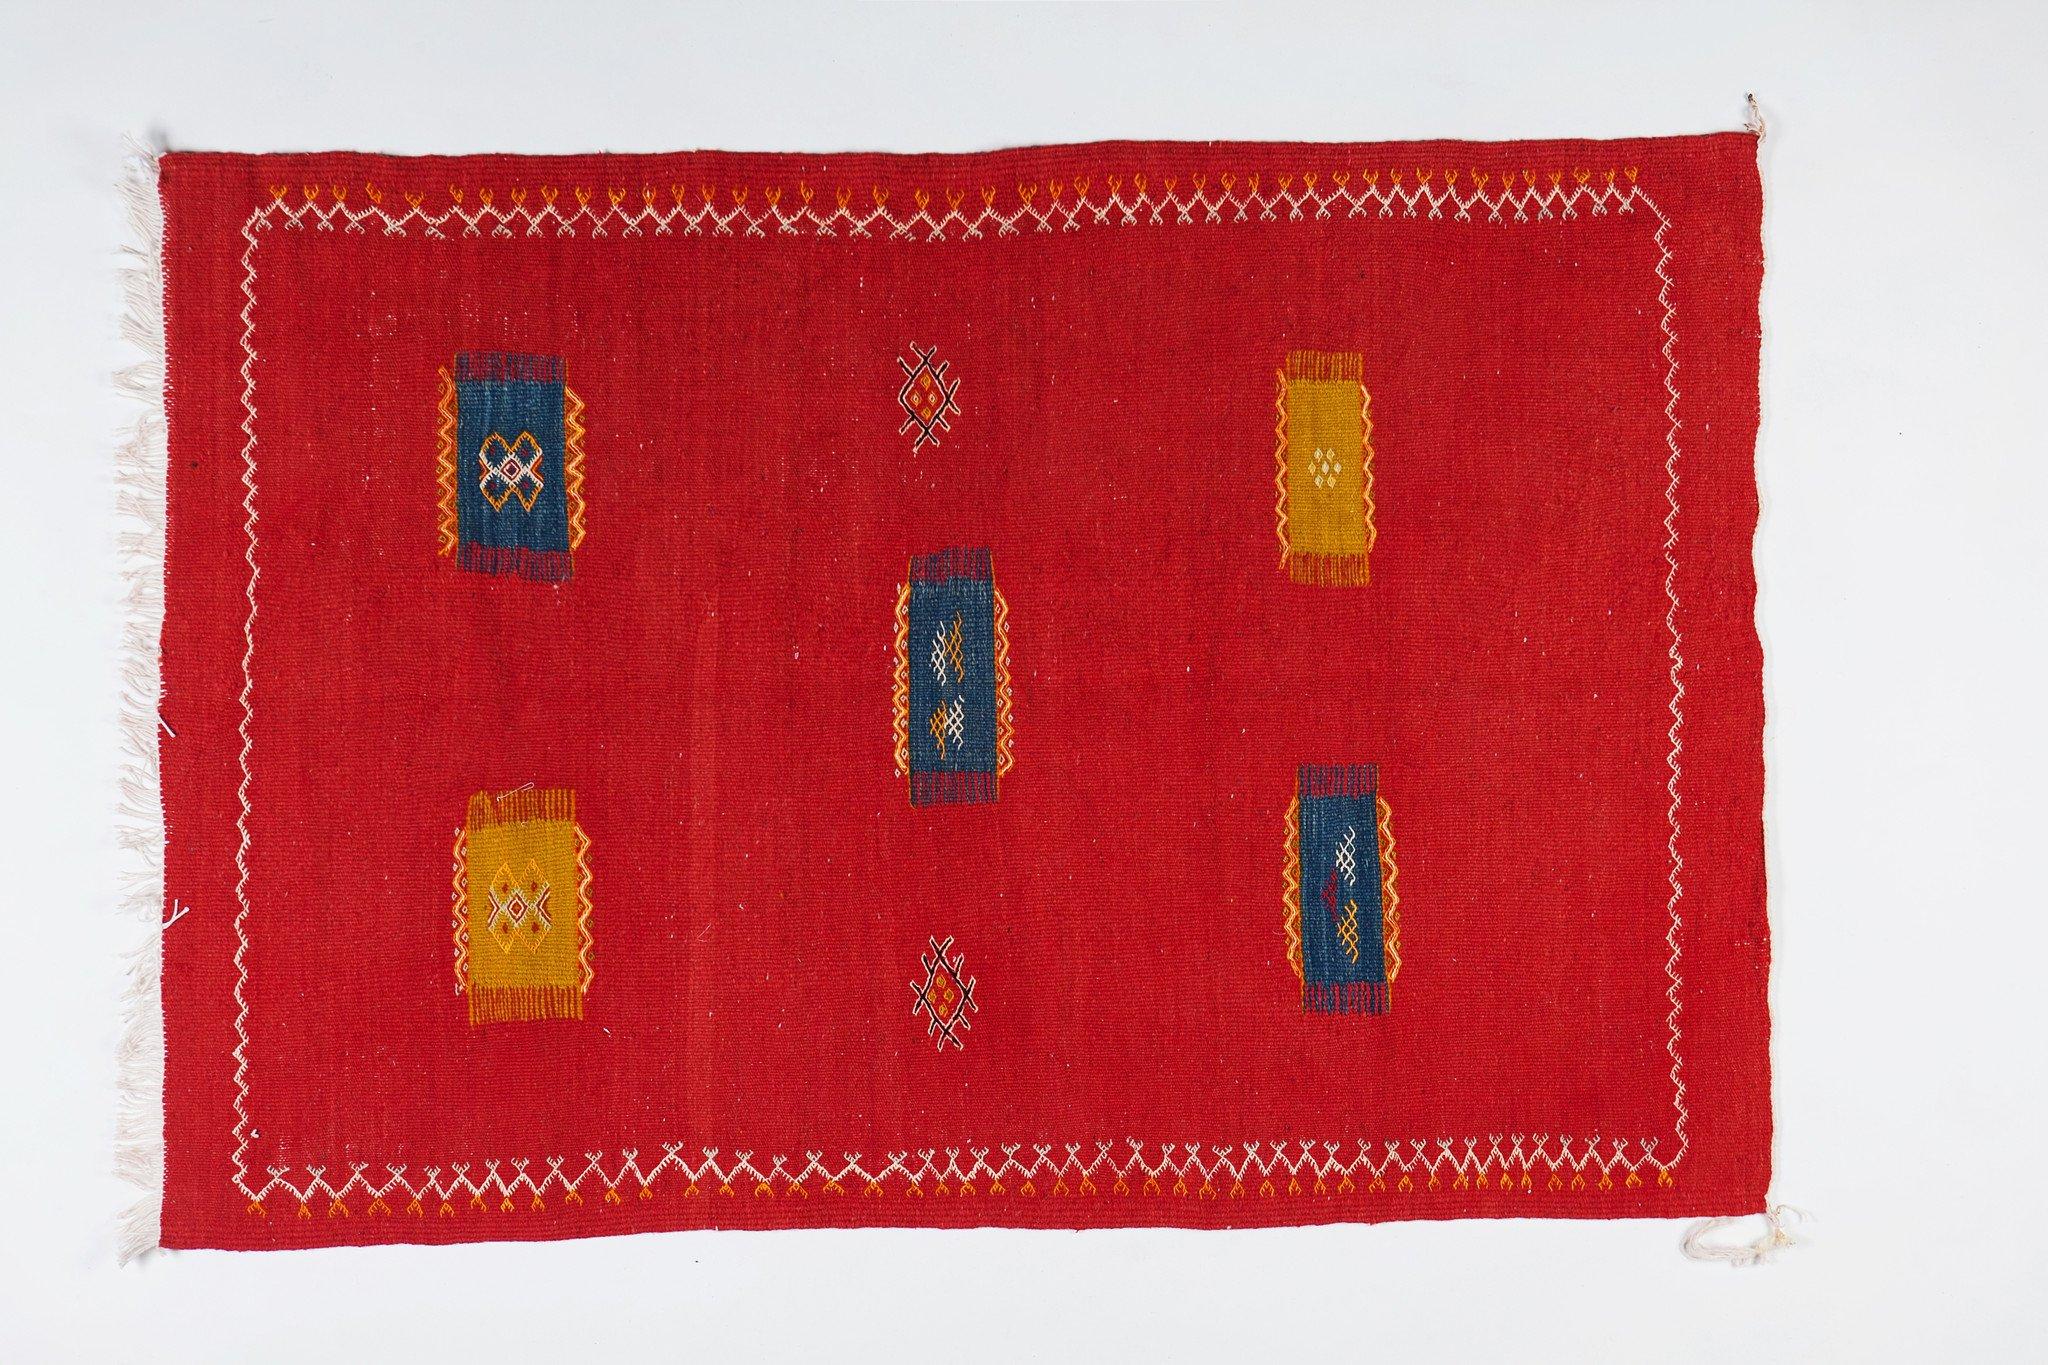 Medium Berber Rug - Tribal Handwoven Wool Organic Red Dye